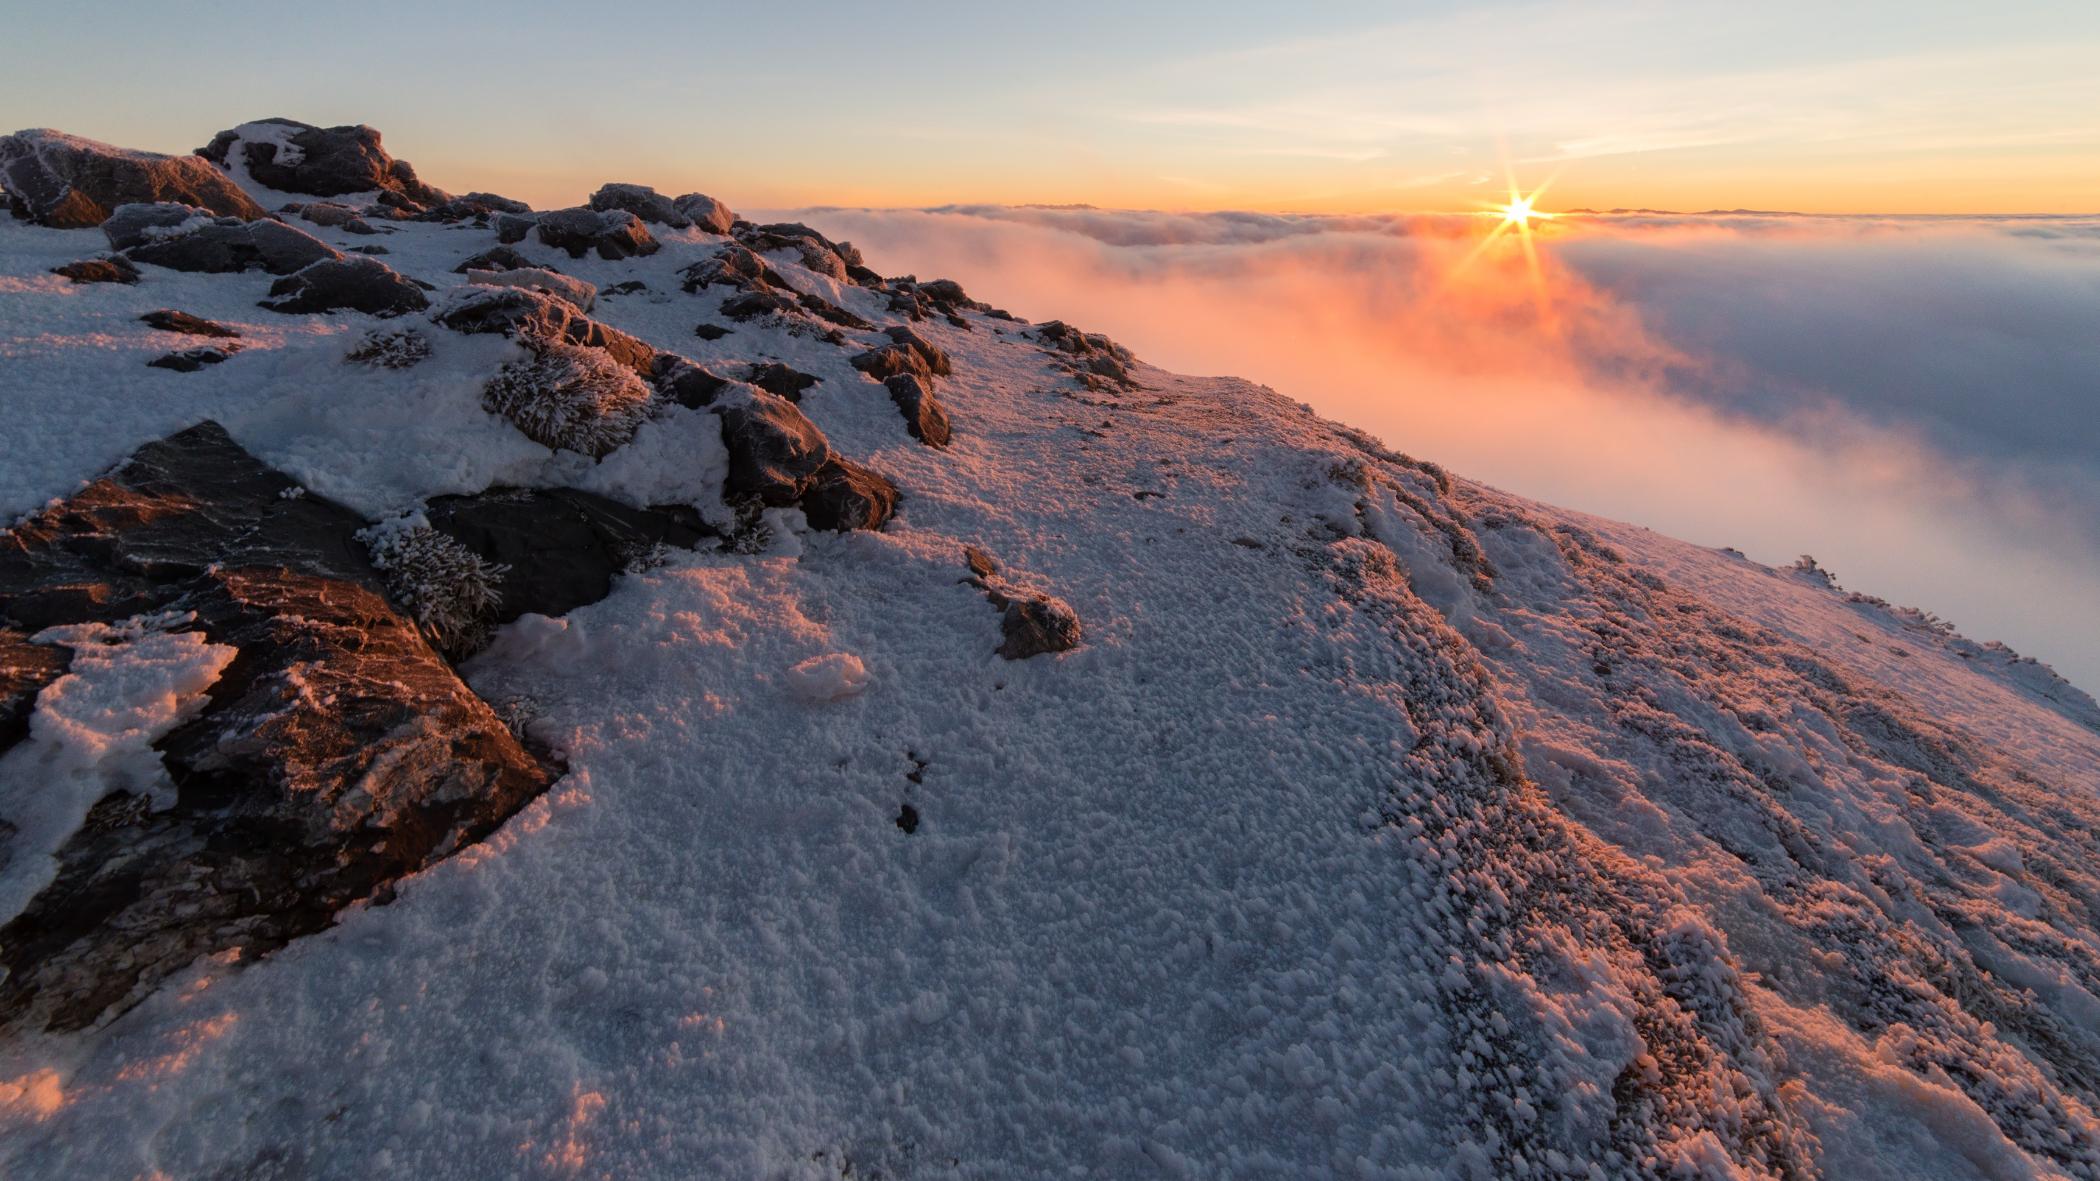 Sunrise at Krivan